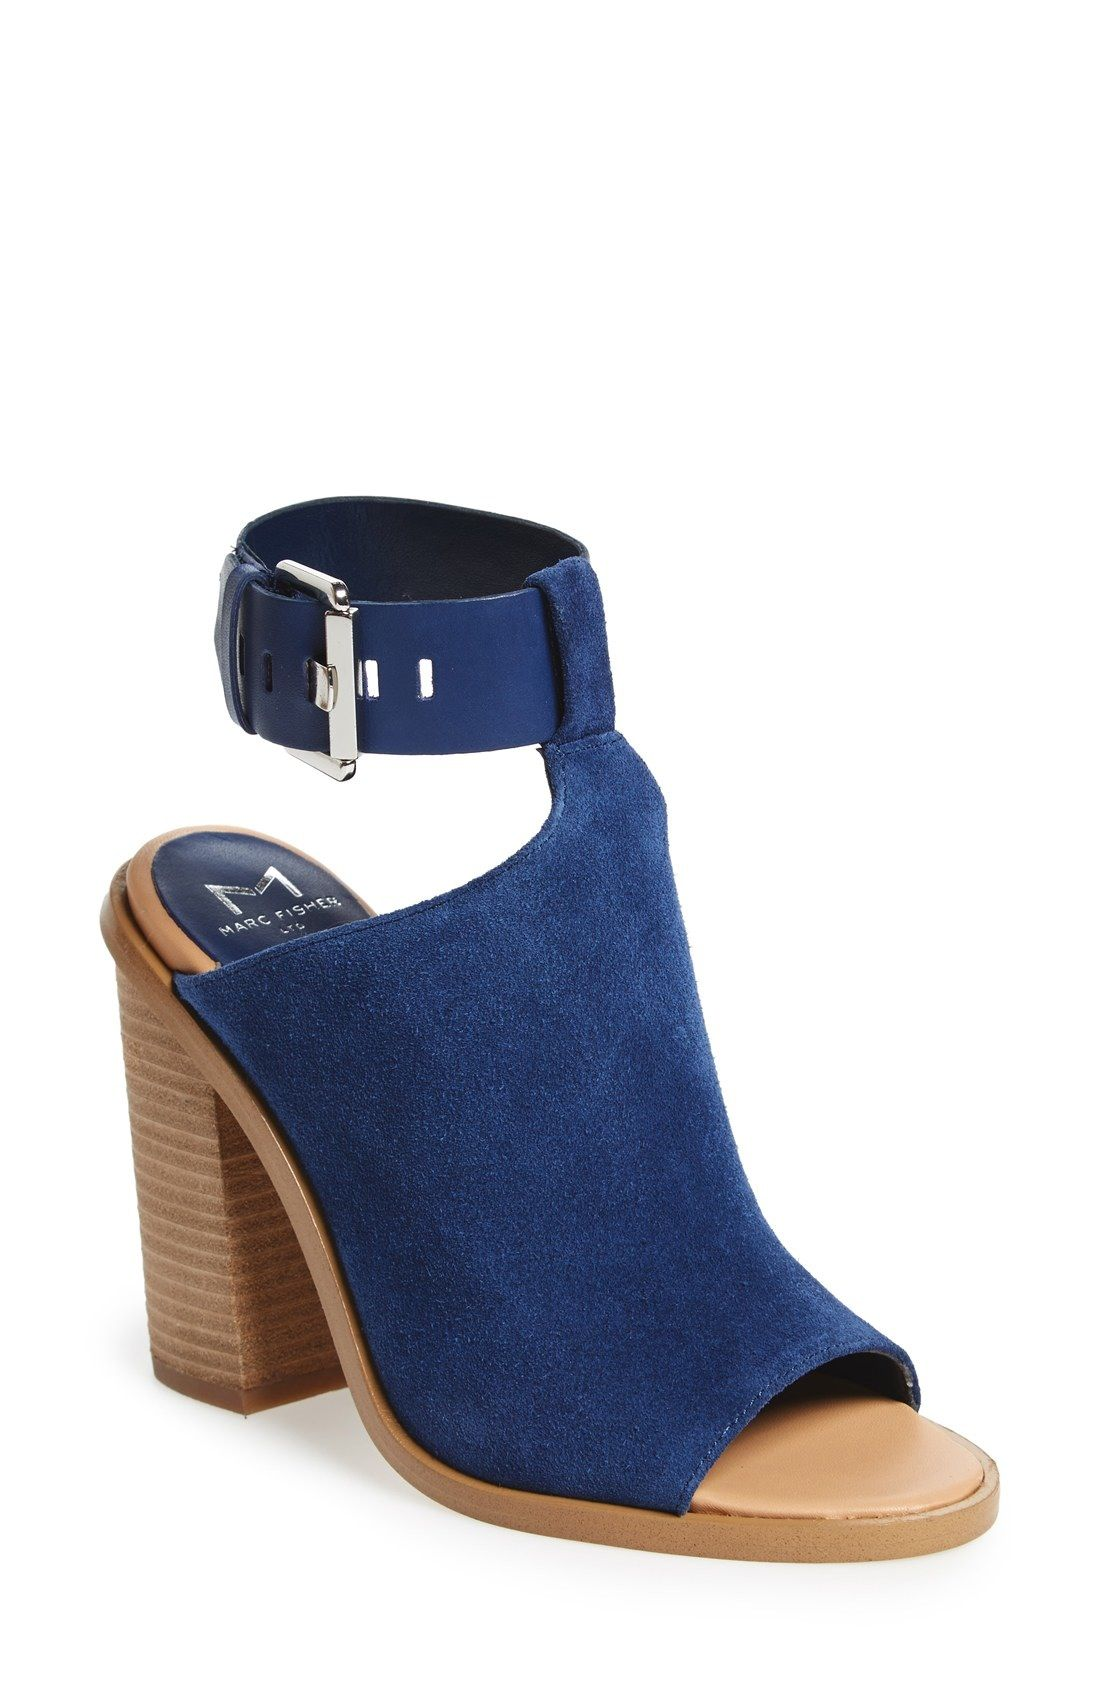 4f6f025d94e Marc Fisher LTD  Vashi  Ankle Strap Sandal (Women) available at  Nordstrom